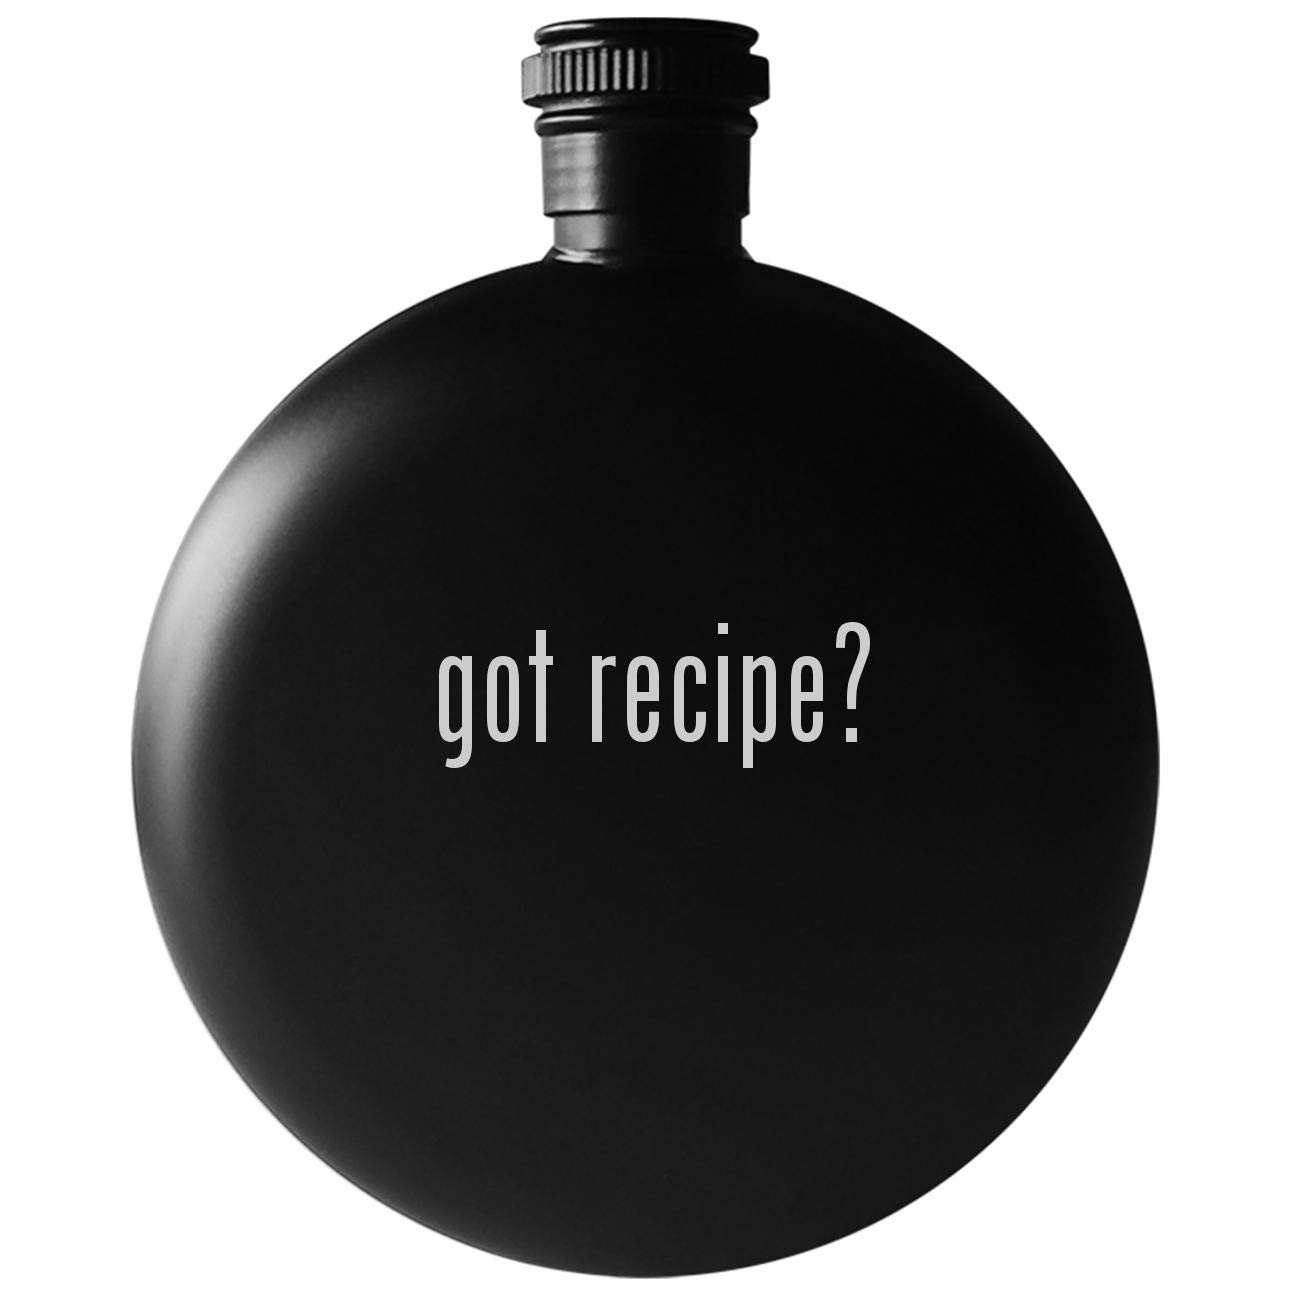 got recipe? - 5oz Round Drinking Alcohol Flask, Matte Black